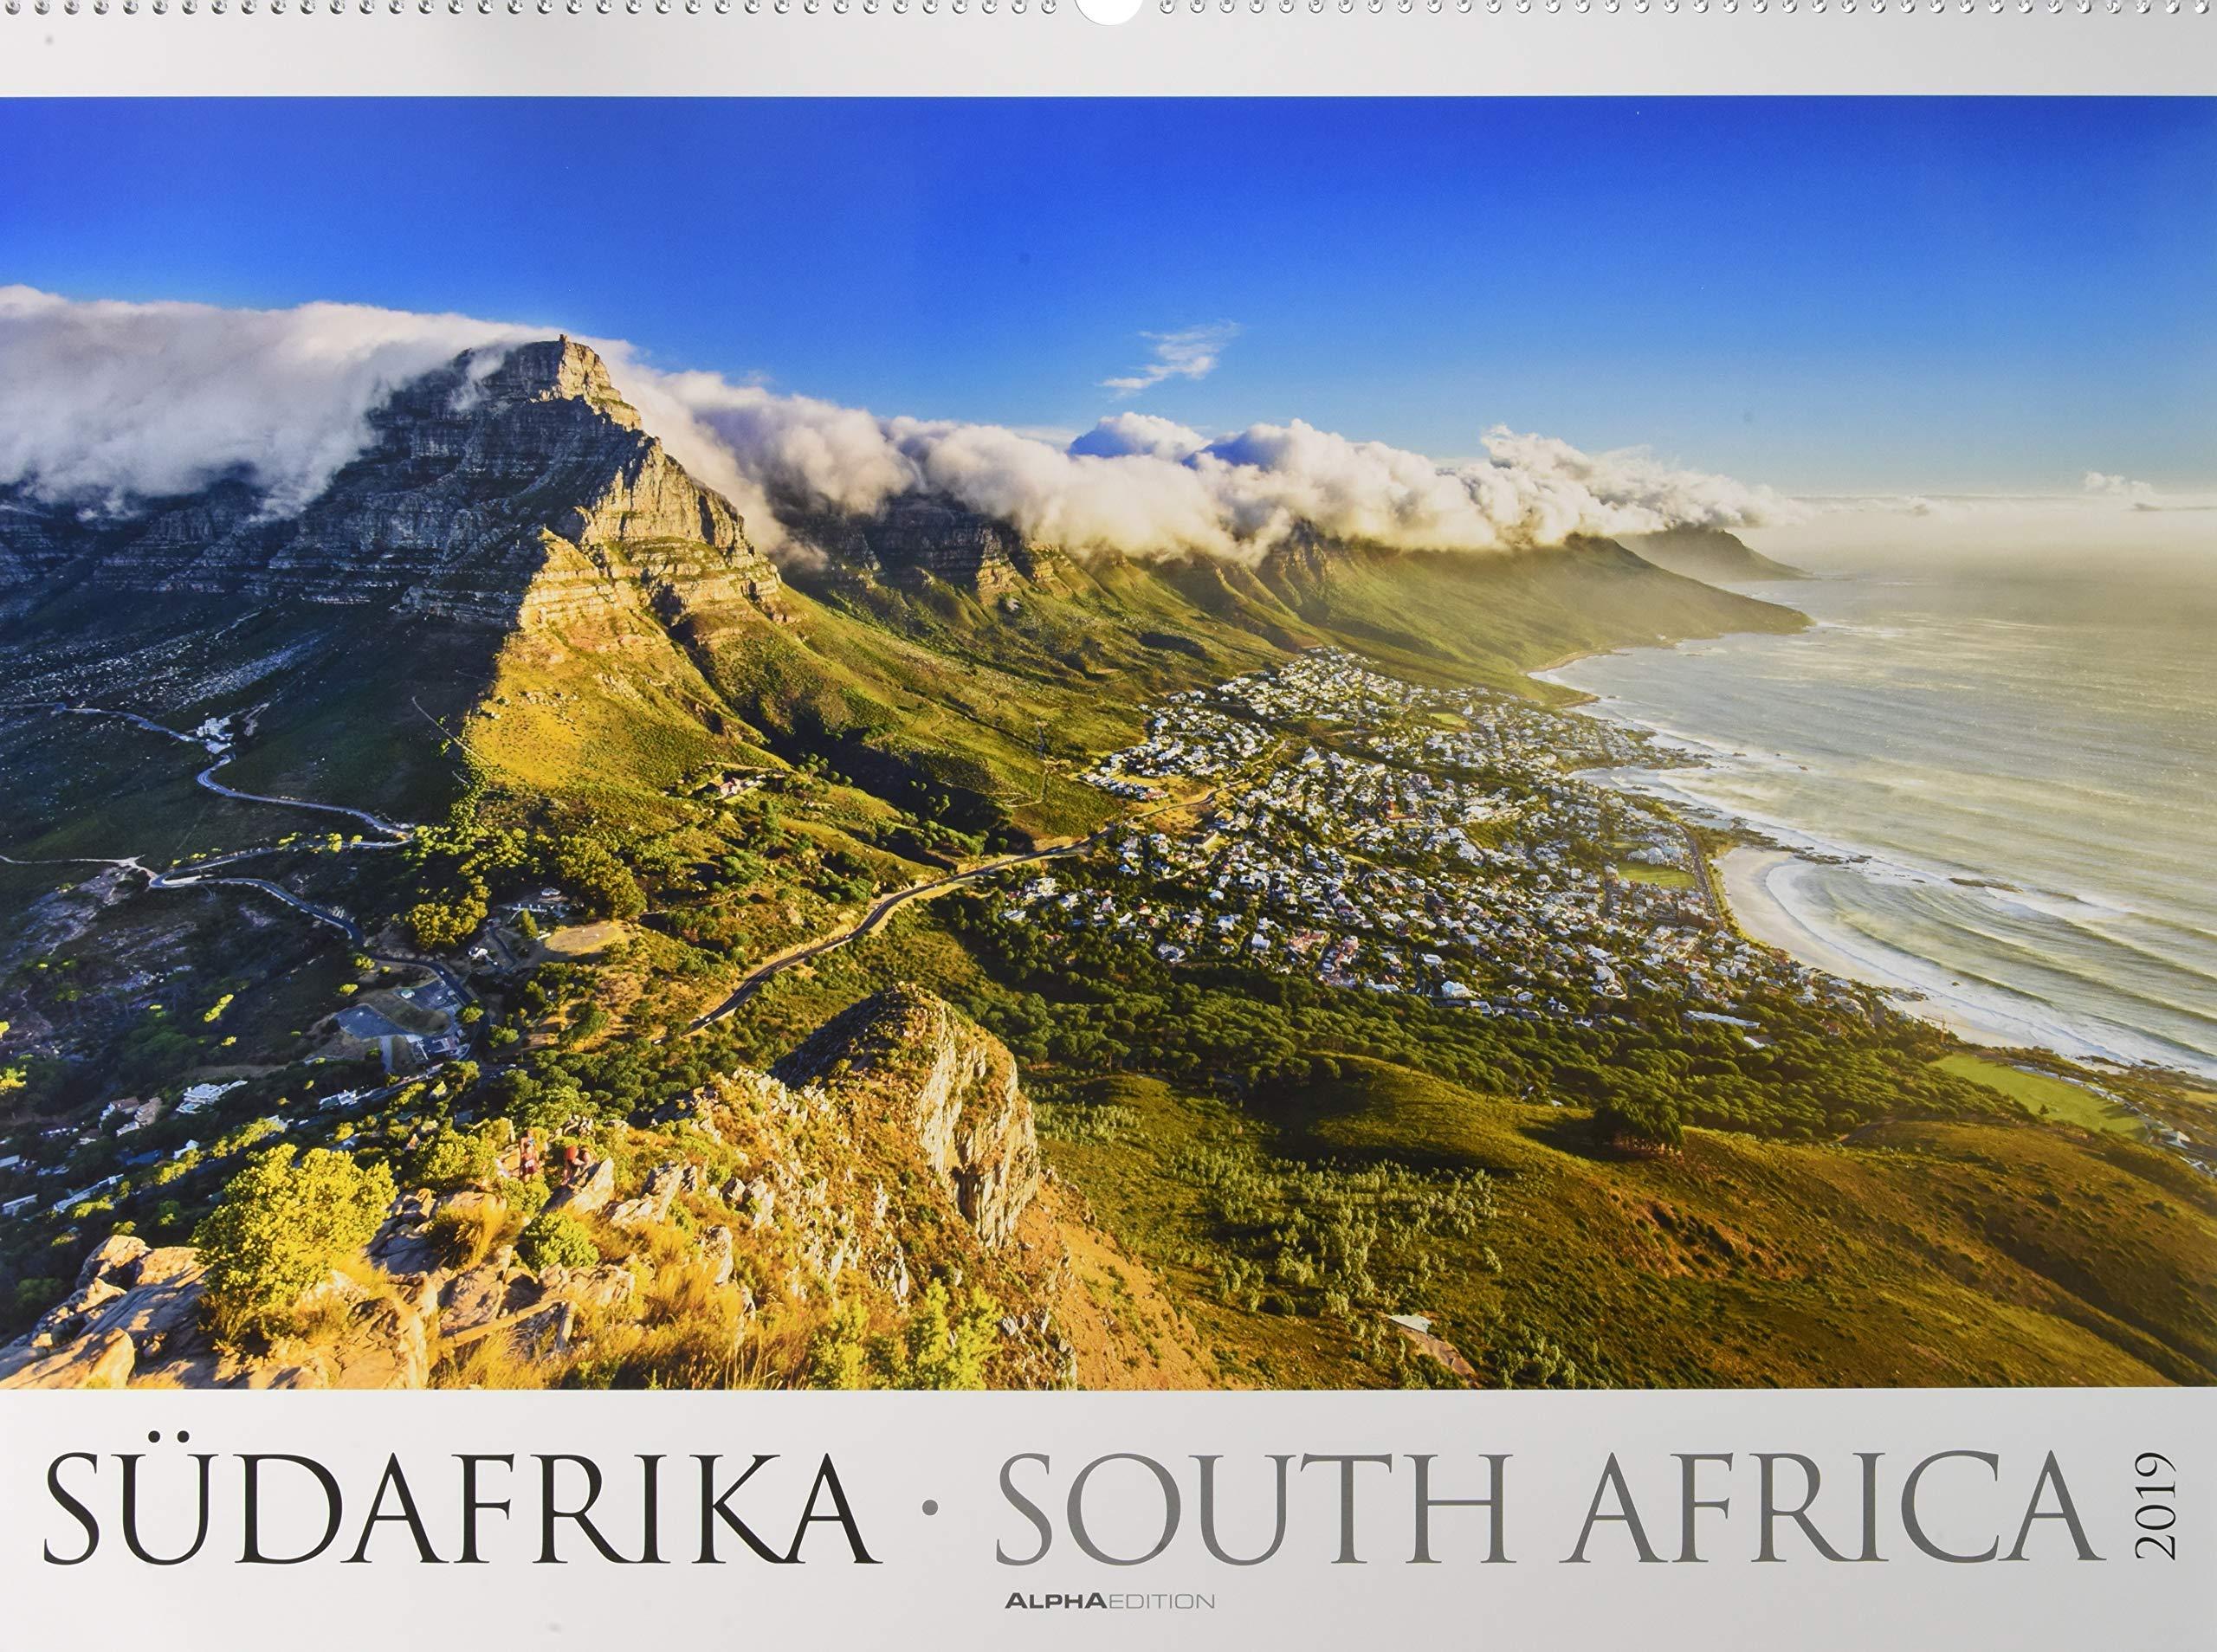 Südafrika 2019 - South Africa - Bildkalender XXL (64 x 48) - Landschaftskalender - Naturkalender Kalender – Posterkalender, Wandkalender ALPHA EDITION 3840794315 Bildbände / Afrika Südafrika / Bildband